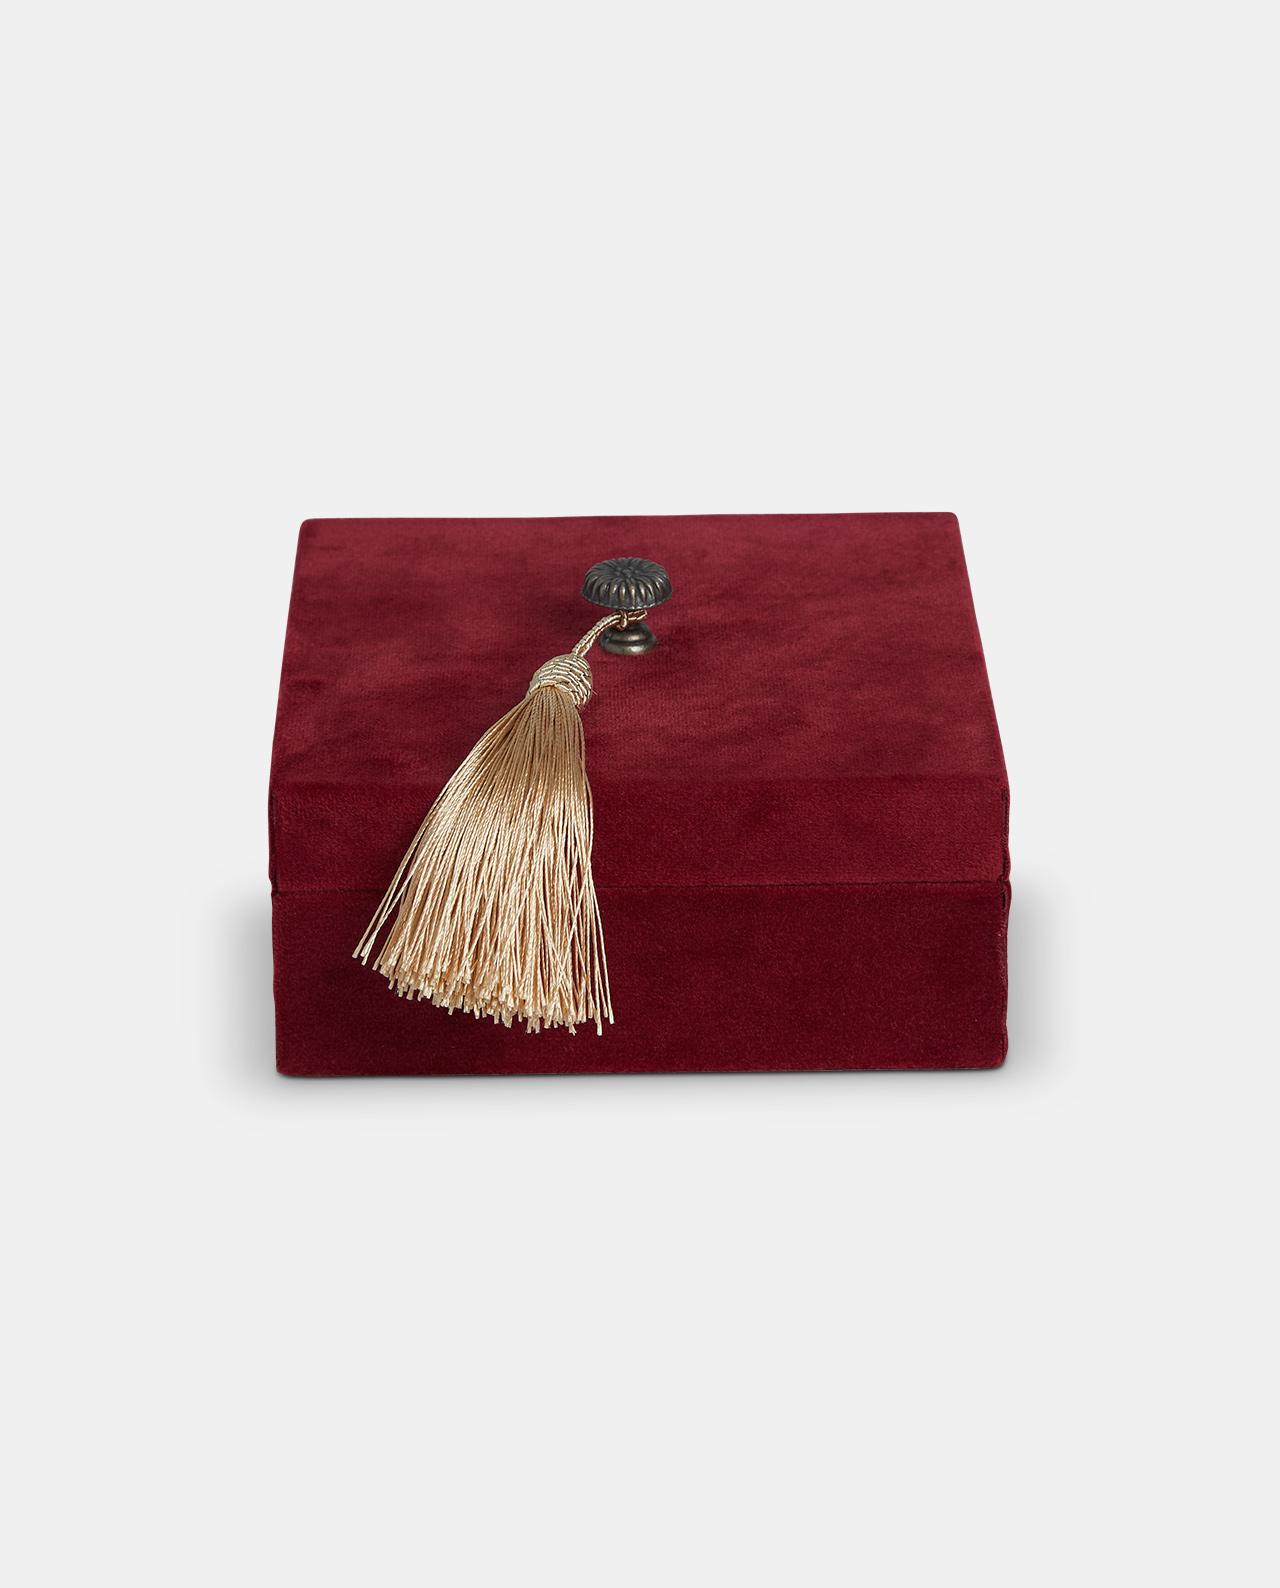 Large Red Velvet Decorative Box